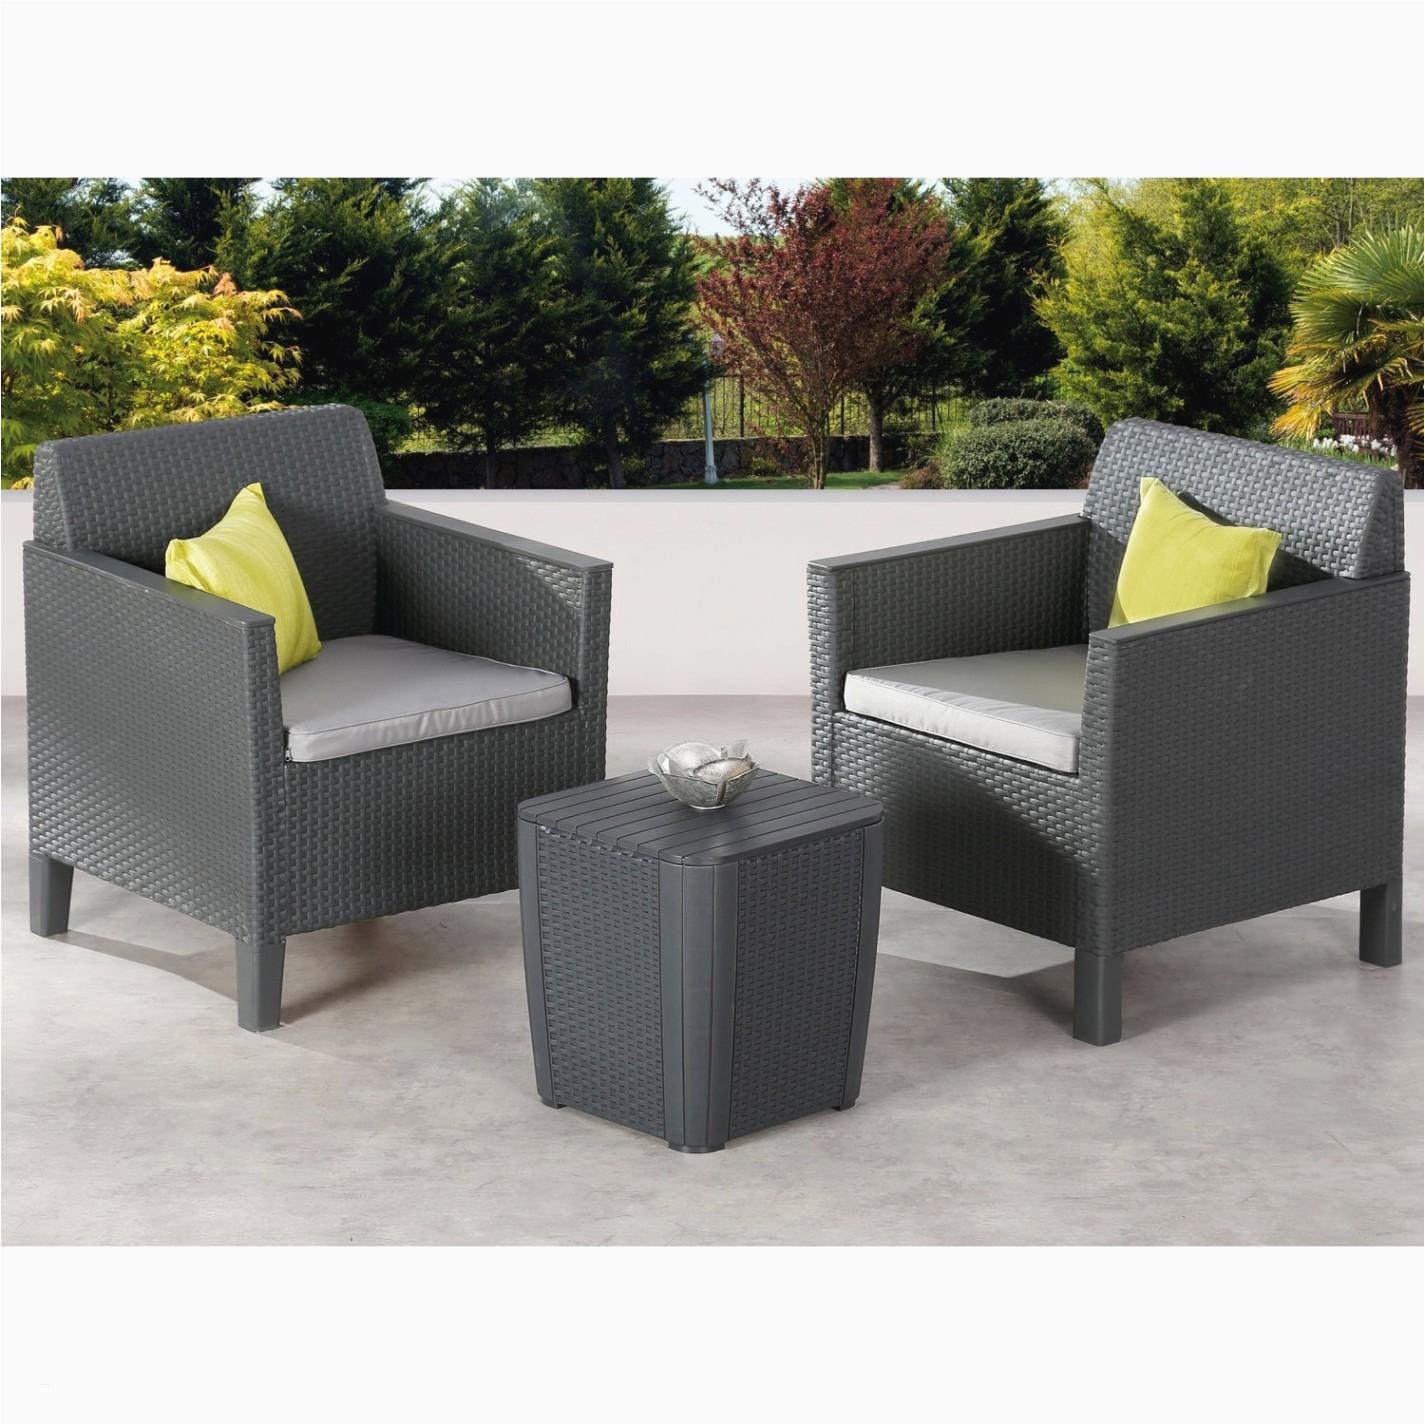 patio furniture sarasota elegant patio chairs sale awesome luxuria¶s wicker outdoor sofa 0d patio